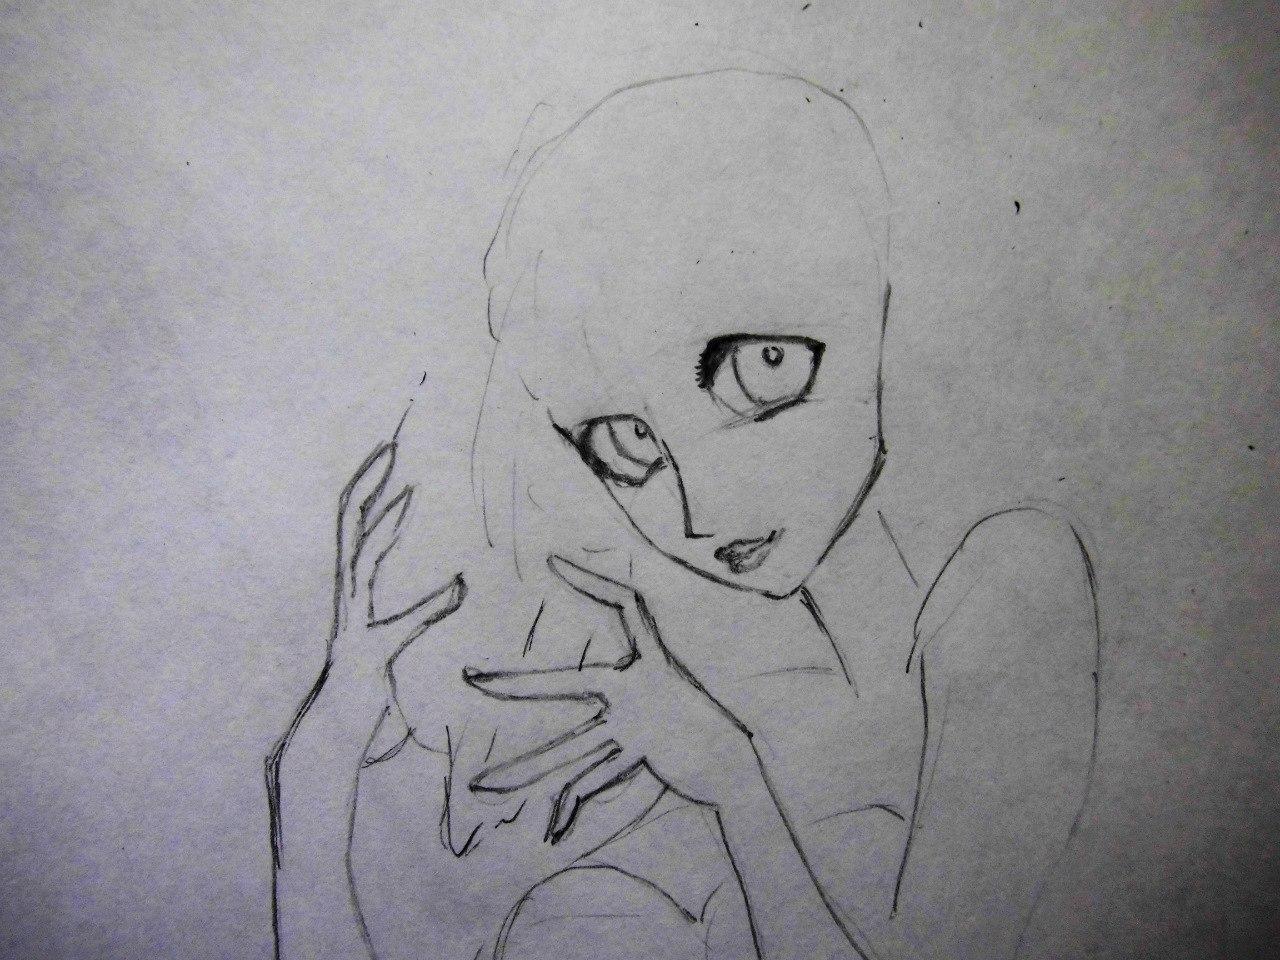 Рисуем милую Ариэль  на бумаге - шаг 4